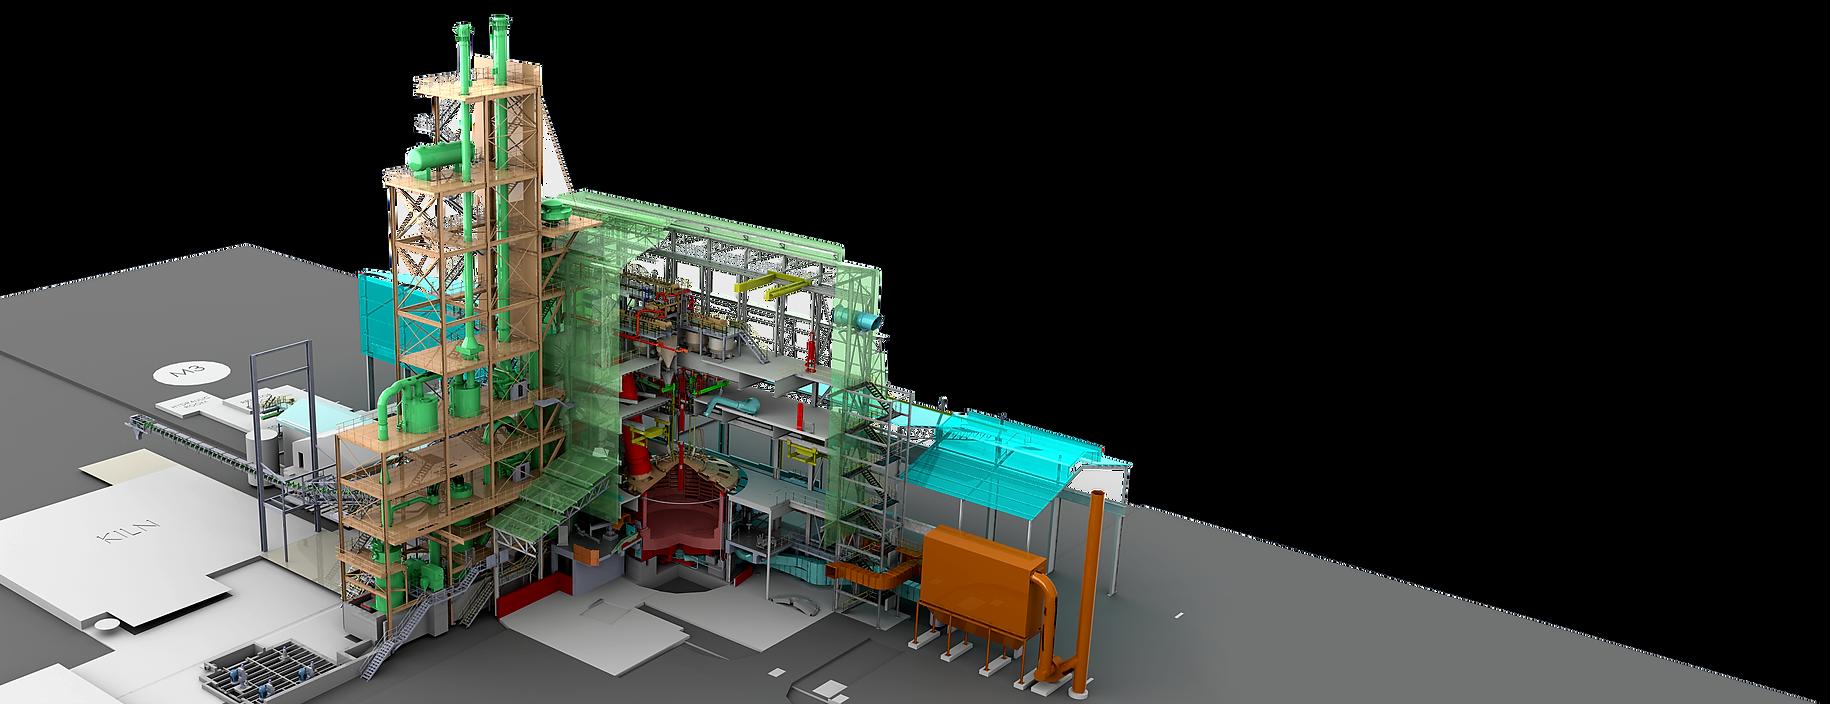 GLPS builds 60MW DC Furnace for Samancor